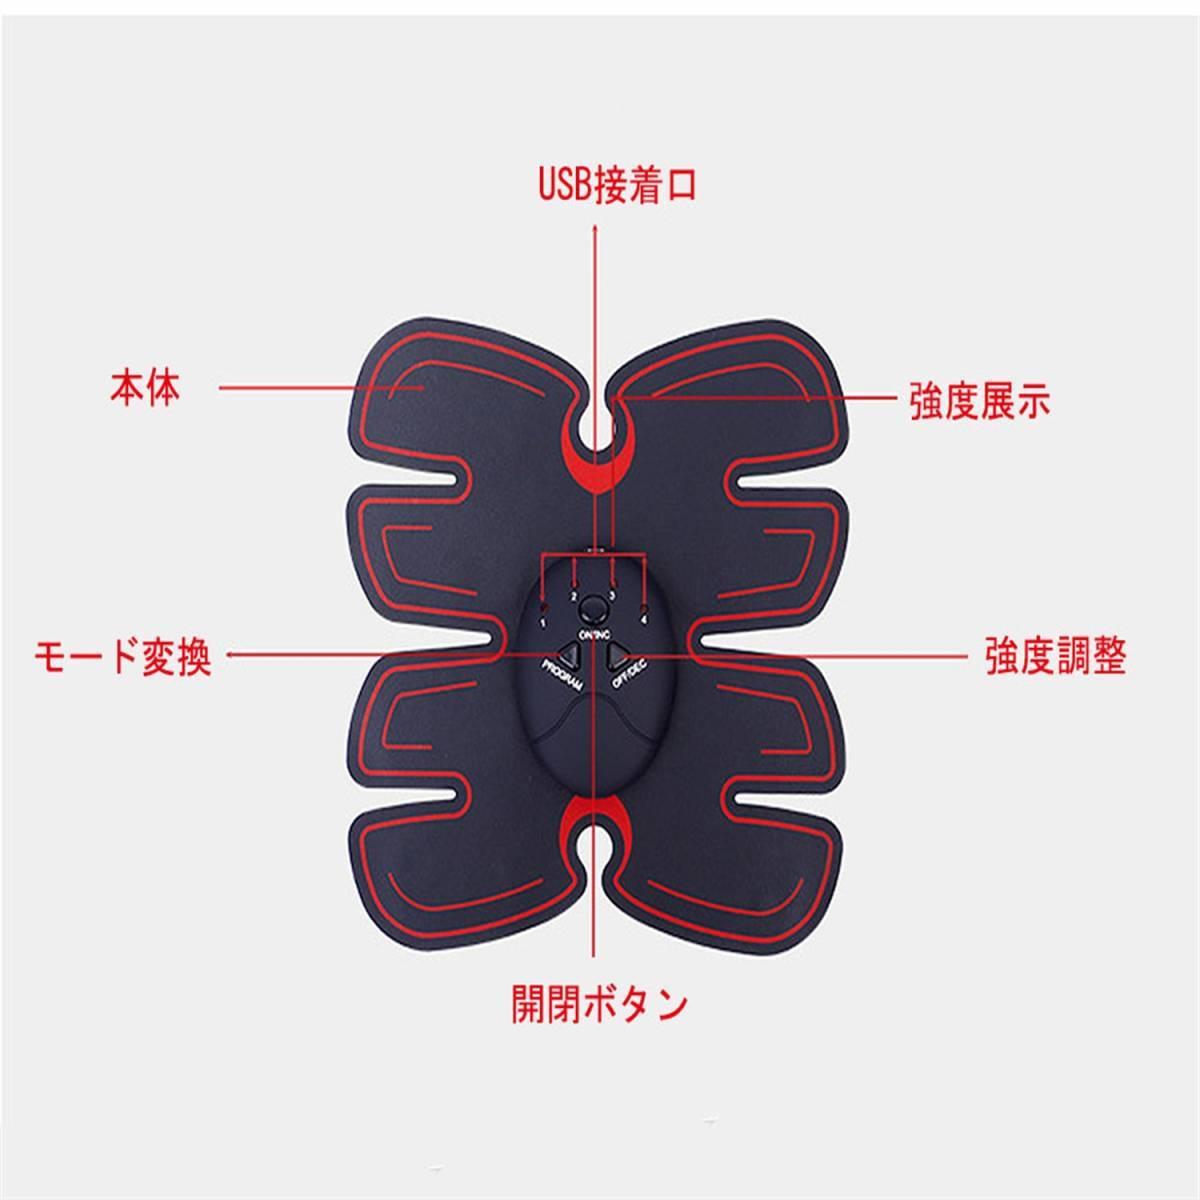 EMS 腹筋ベルト 腹筋マシーン 腹筋パッド 太もも 腕筋 筋トレ器具 ダイエット USB充電式 マッサージ エクササイズ 男女兼用 新品 _画像2